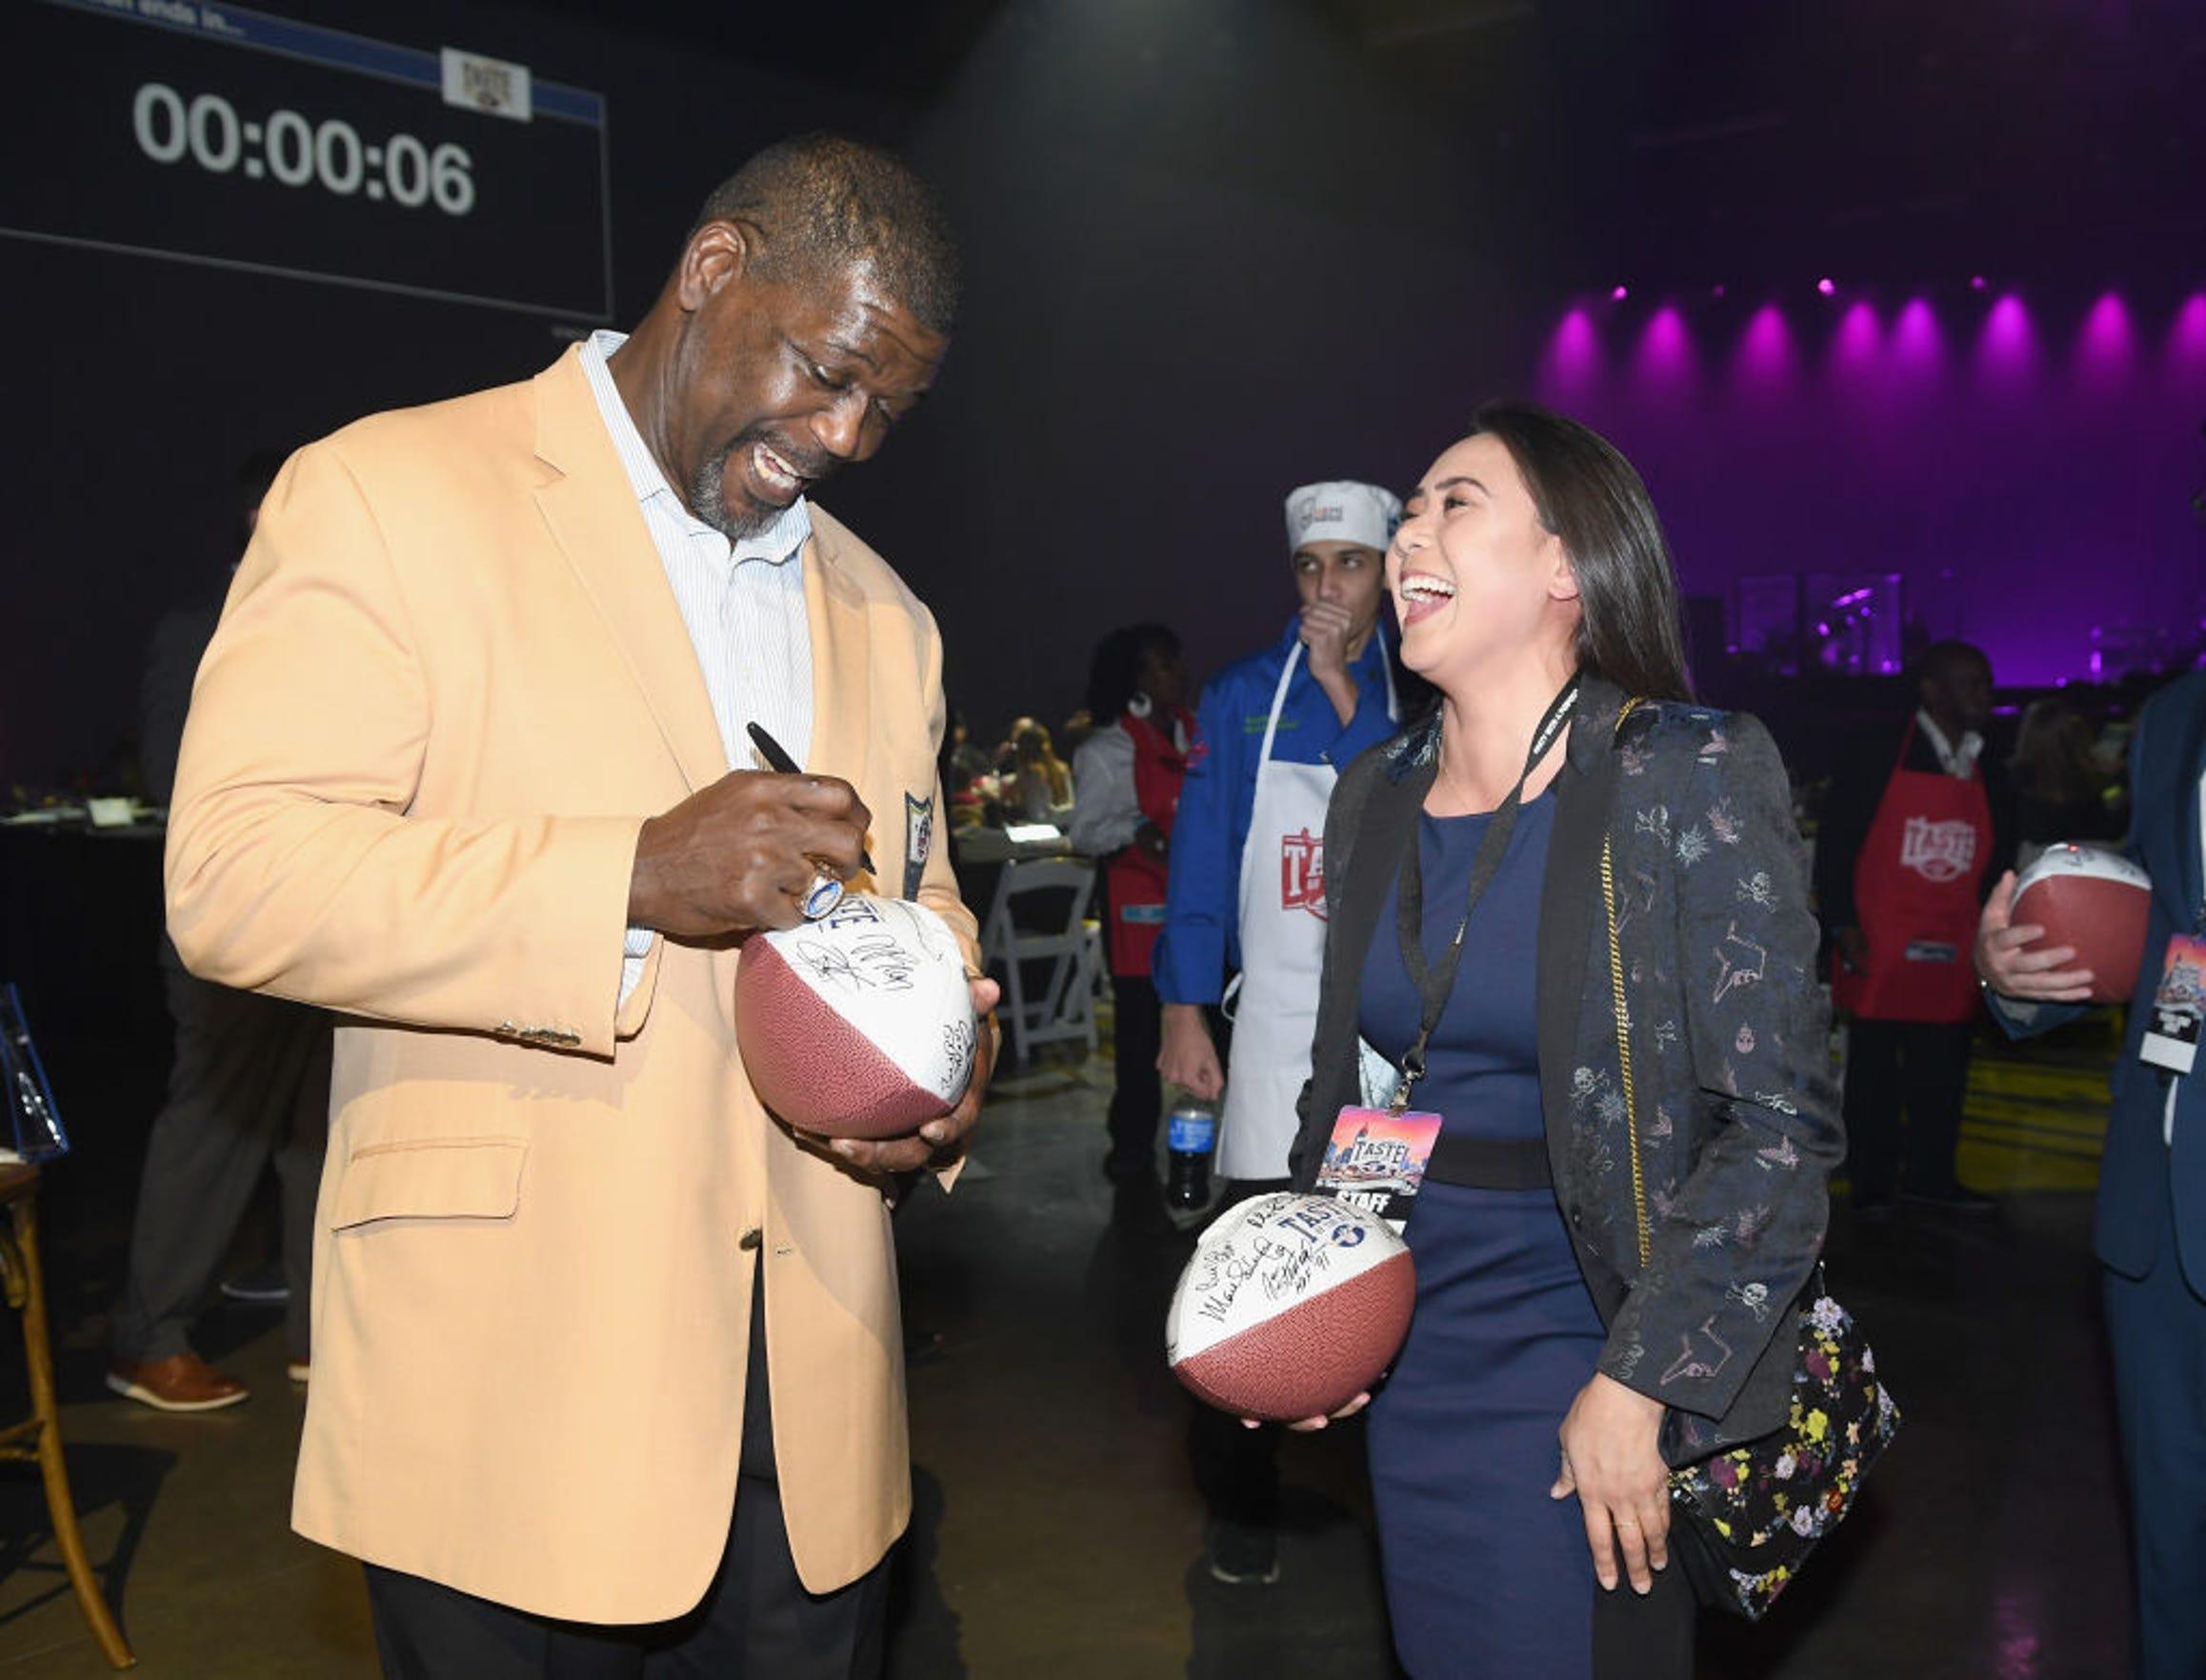 Randall McDaniel, Salón de la Fama de la NFL, firma un autógrafo a una asistente al evento.